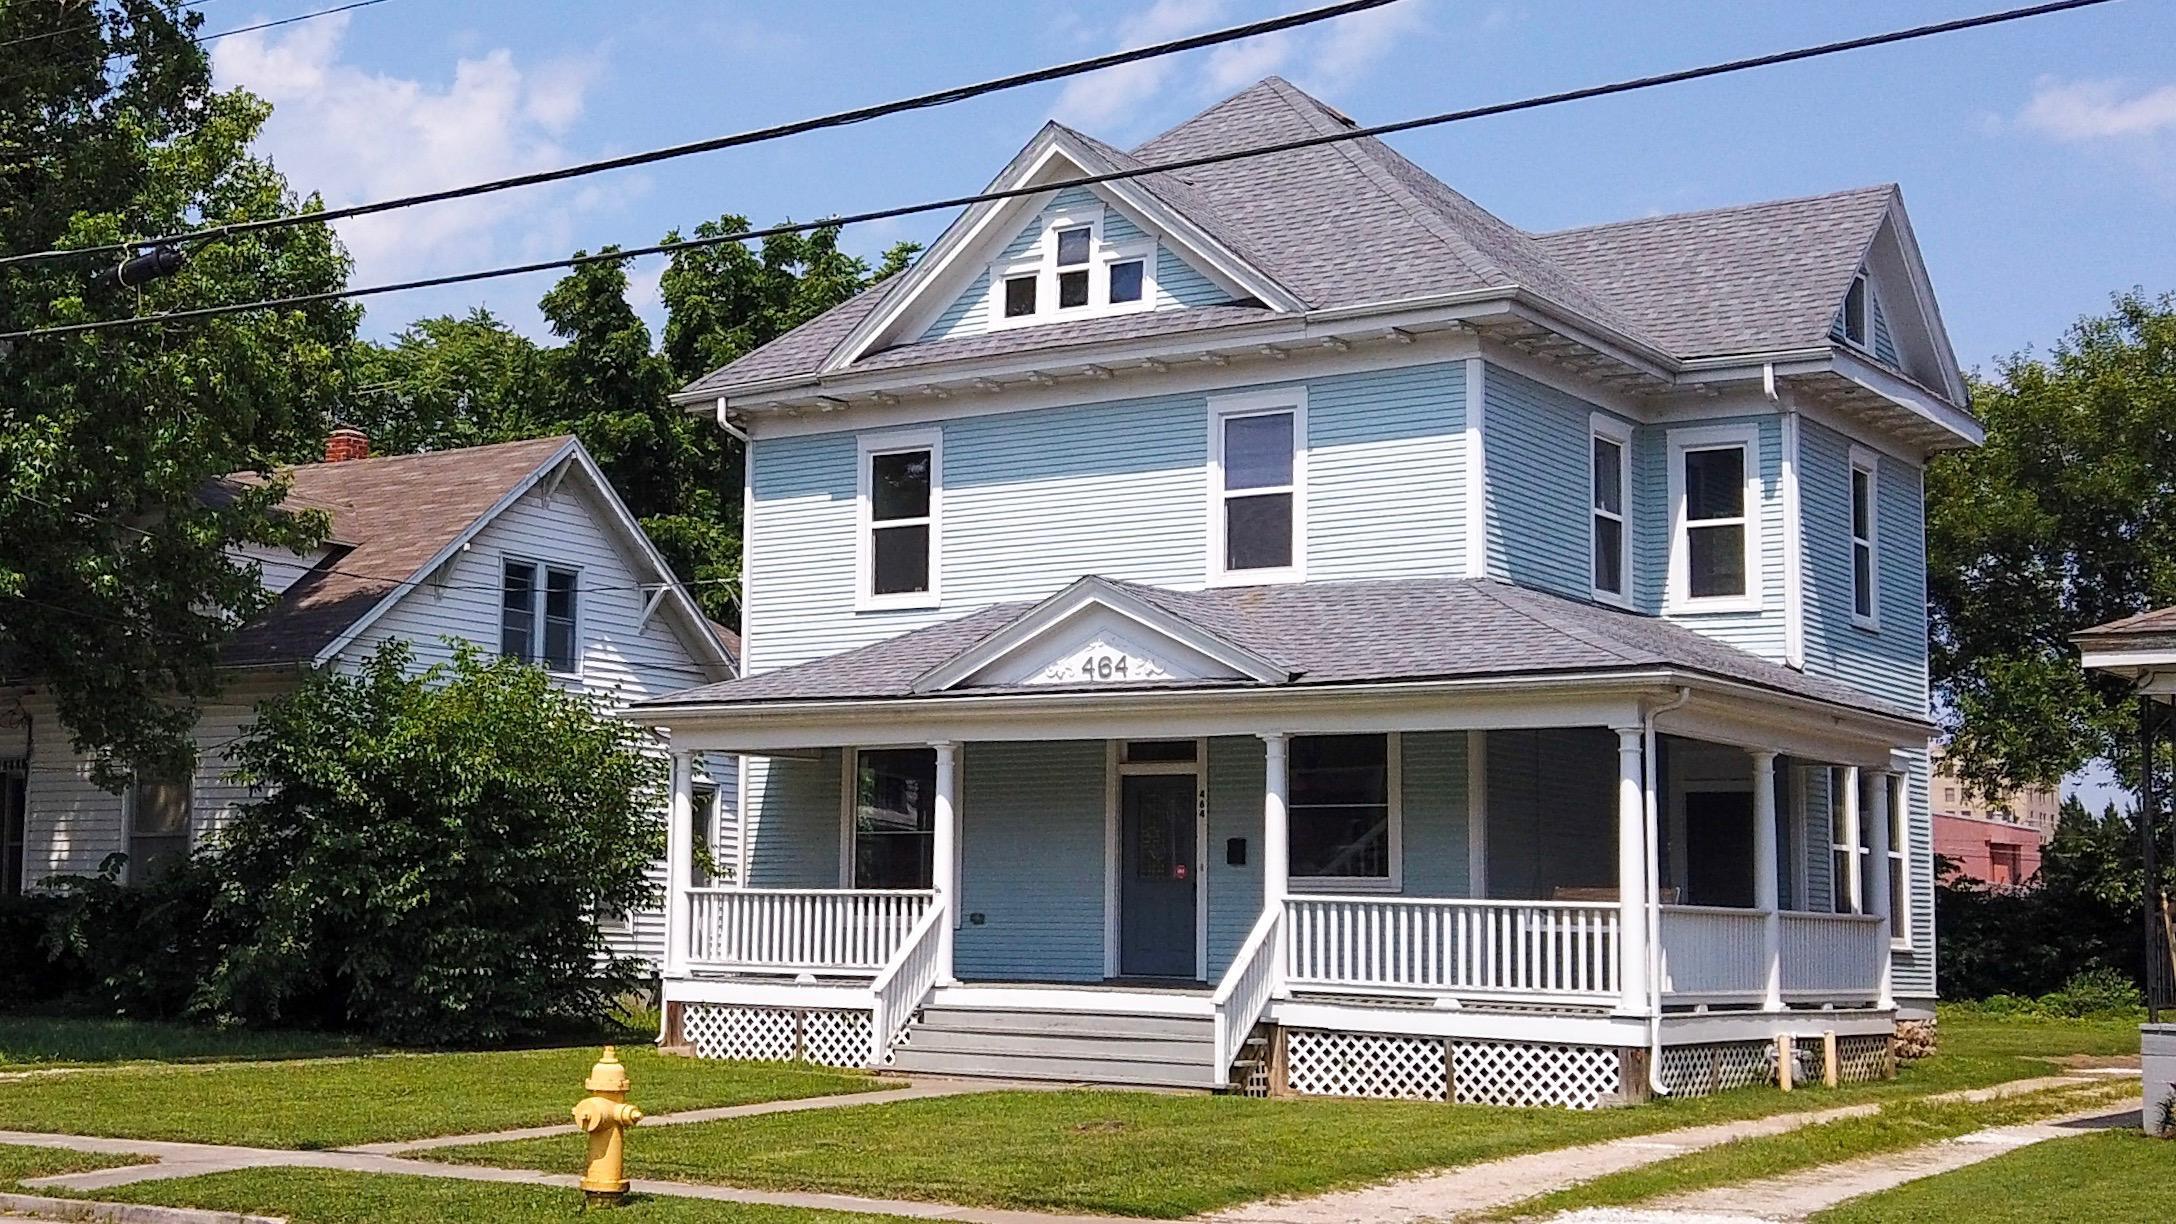 464 South Main Avenue Springfield, MO 65806